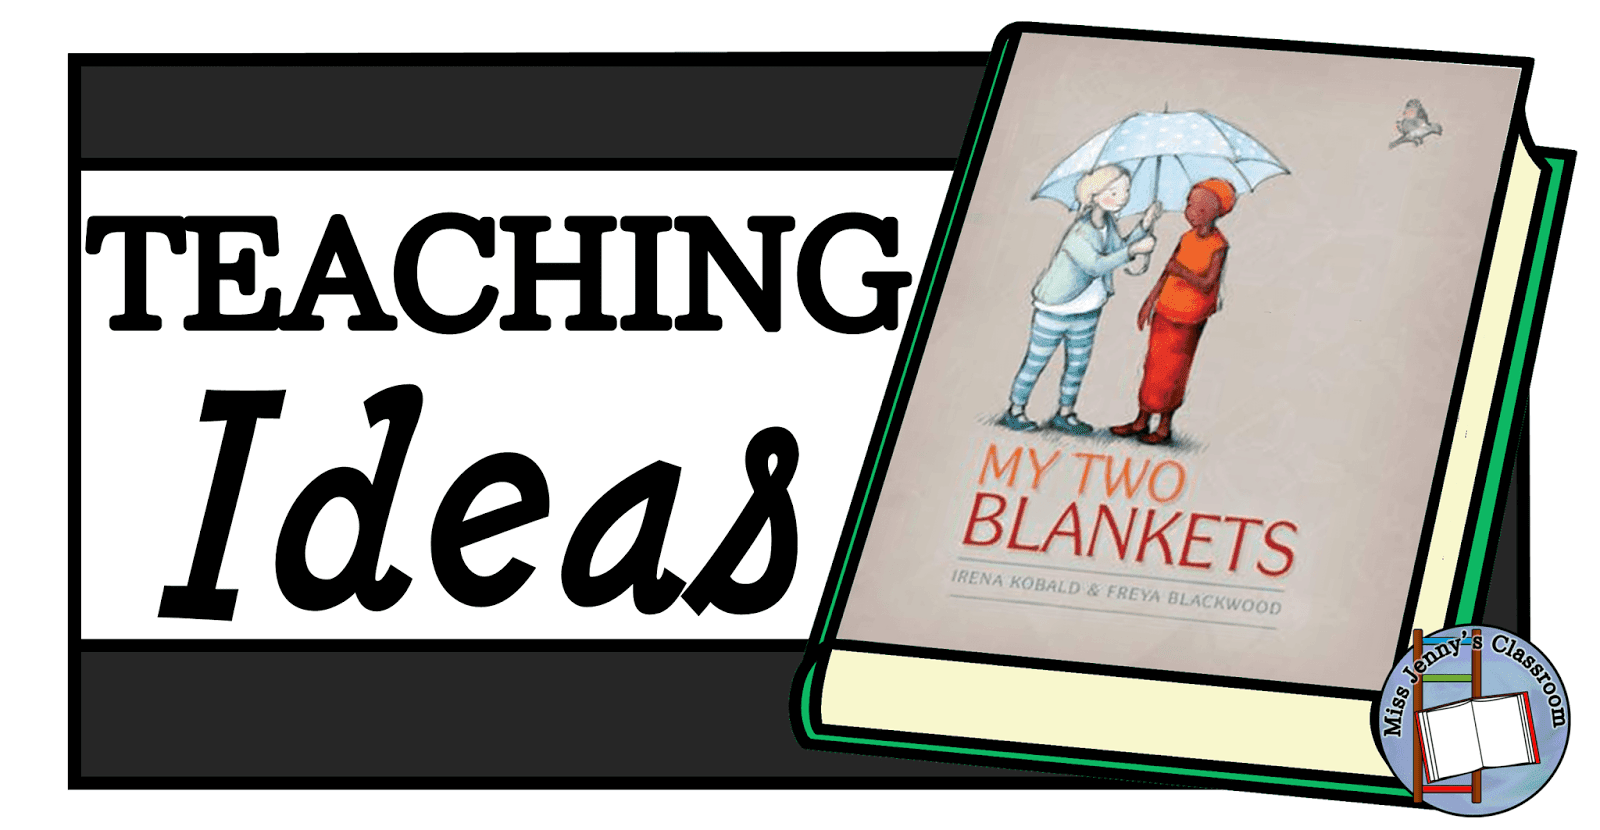 My Two Blankets: Teaching Ideas